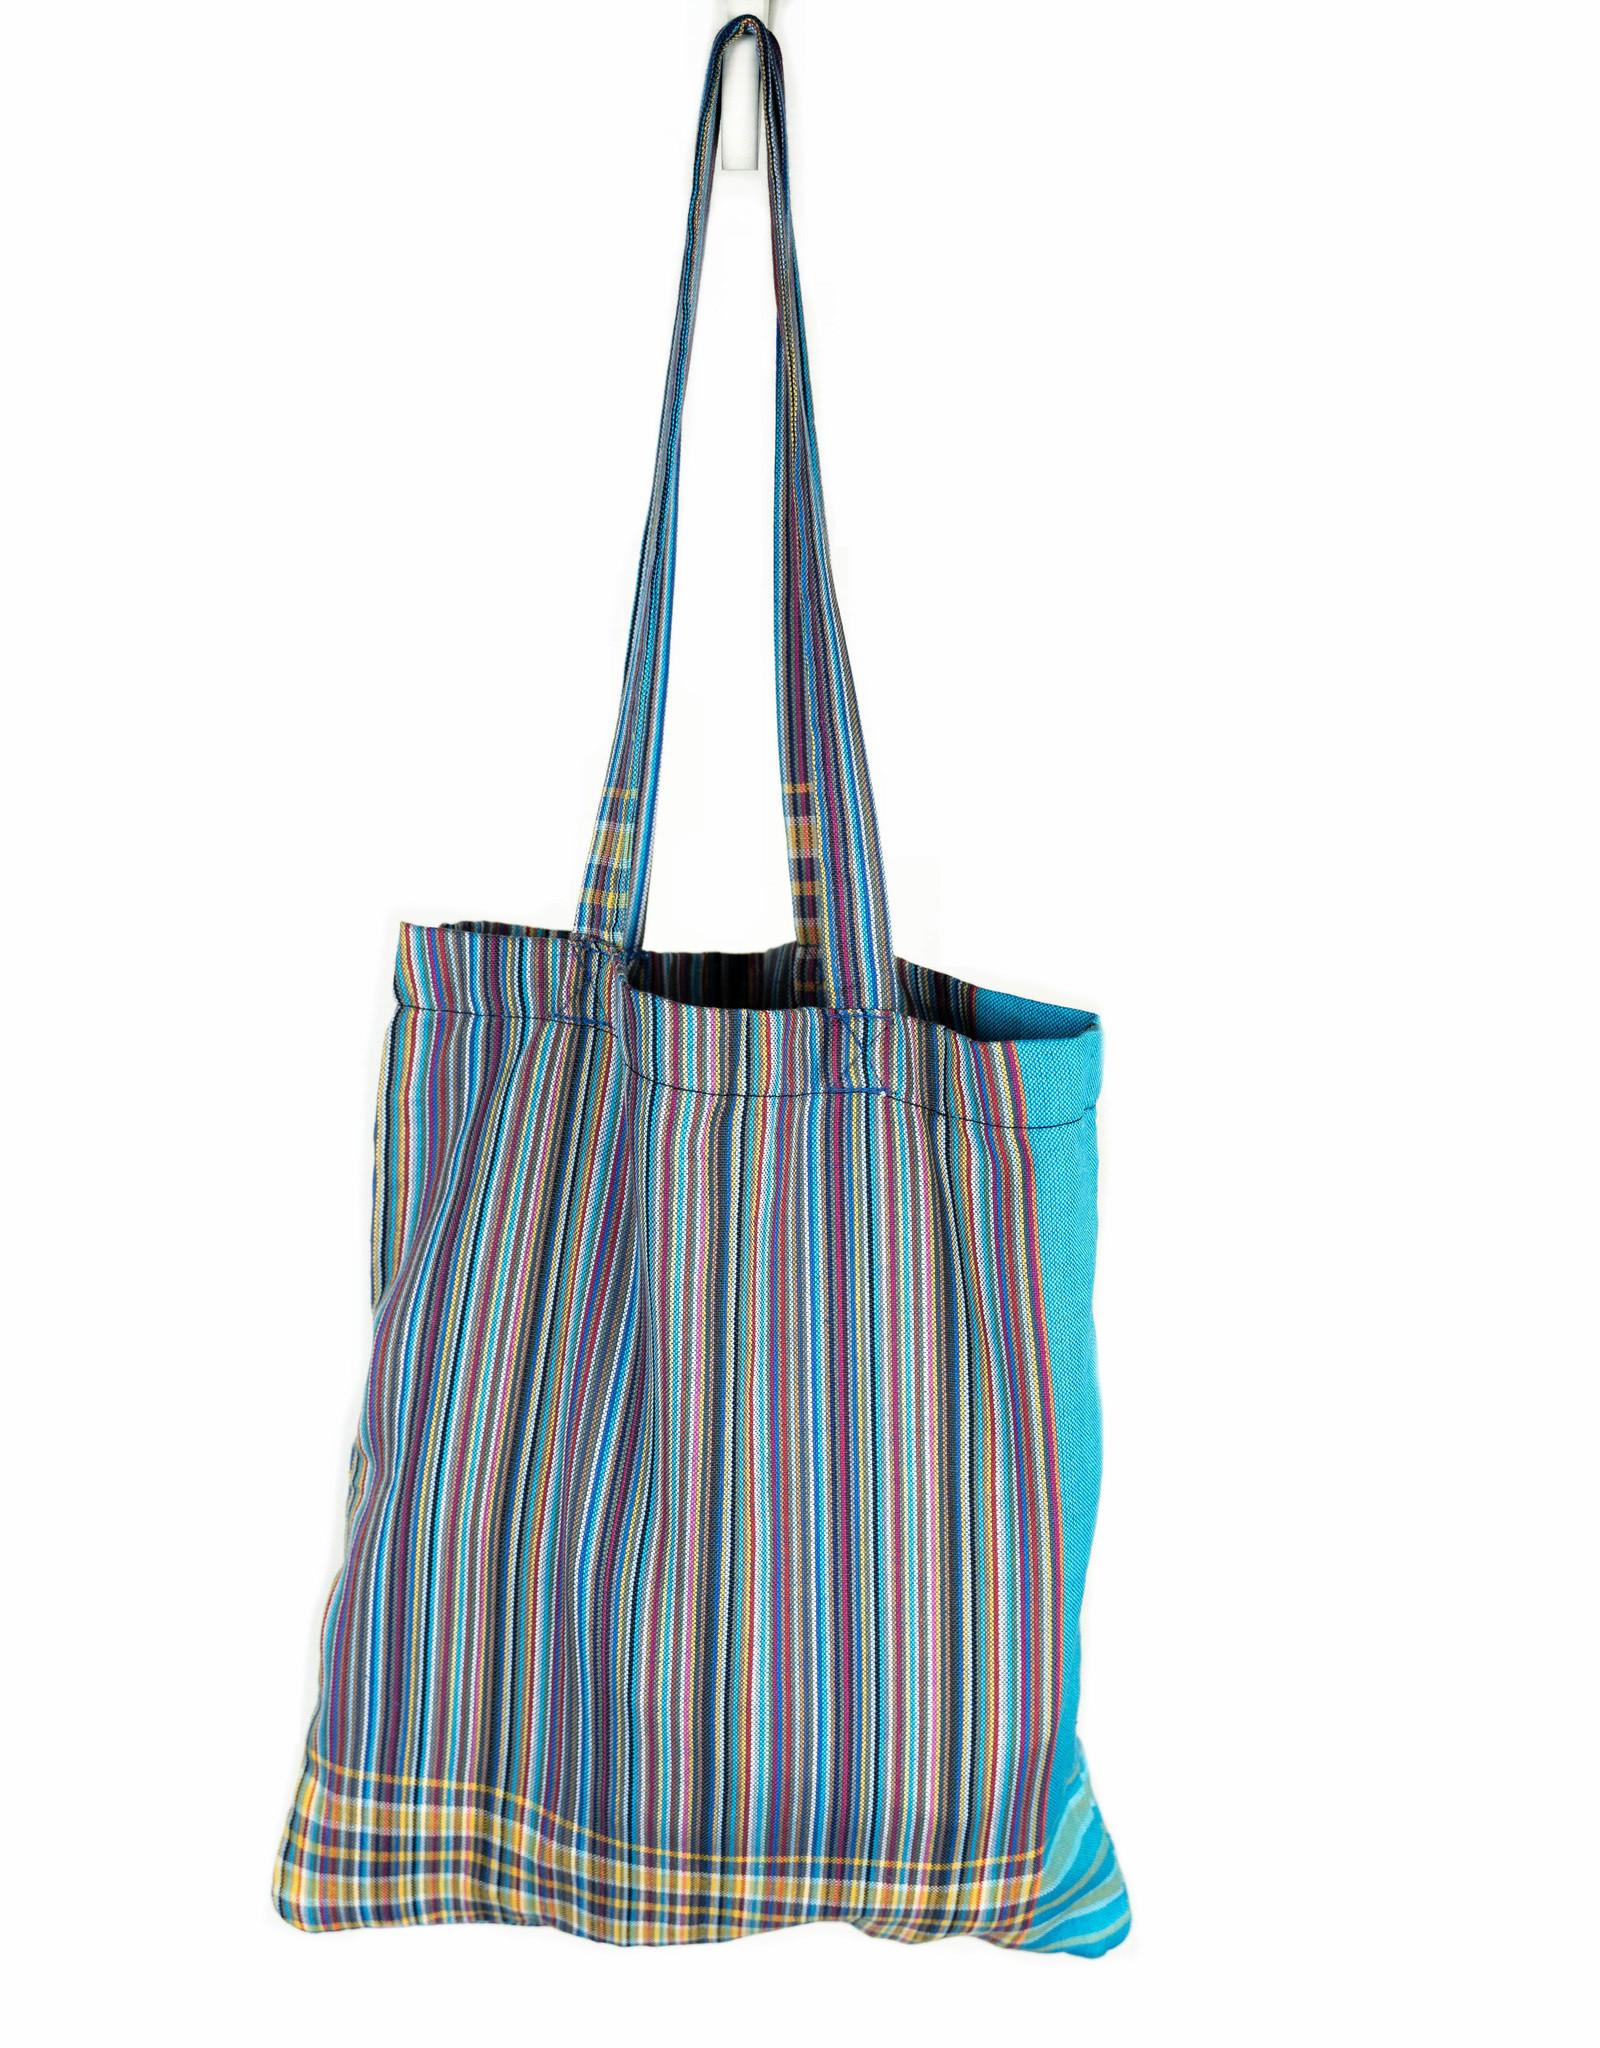 Maisha.Style Kikoy tote bag - stripey mixed blue